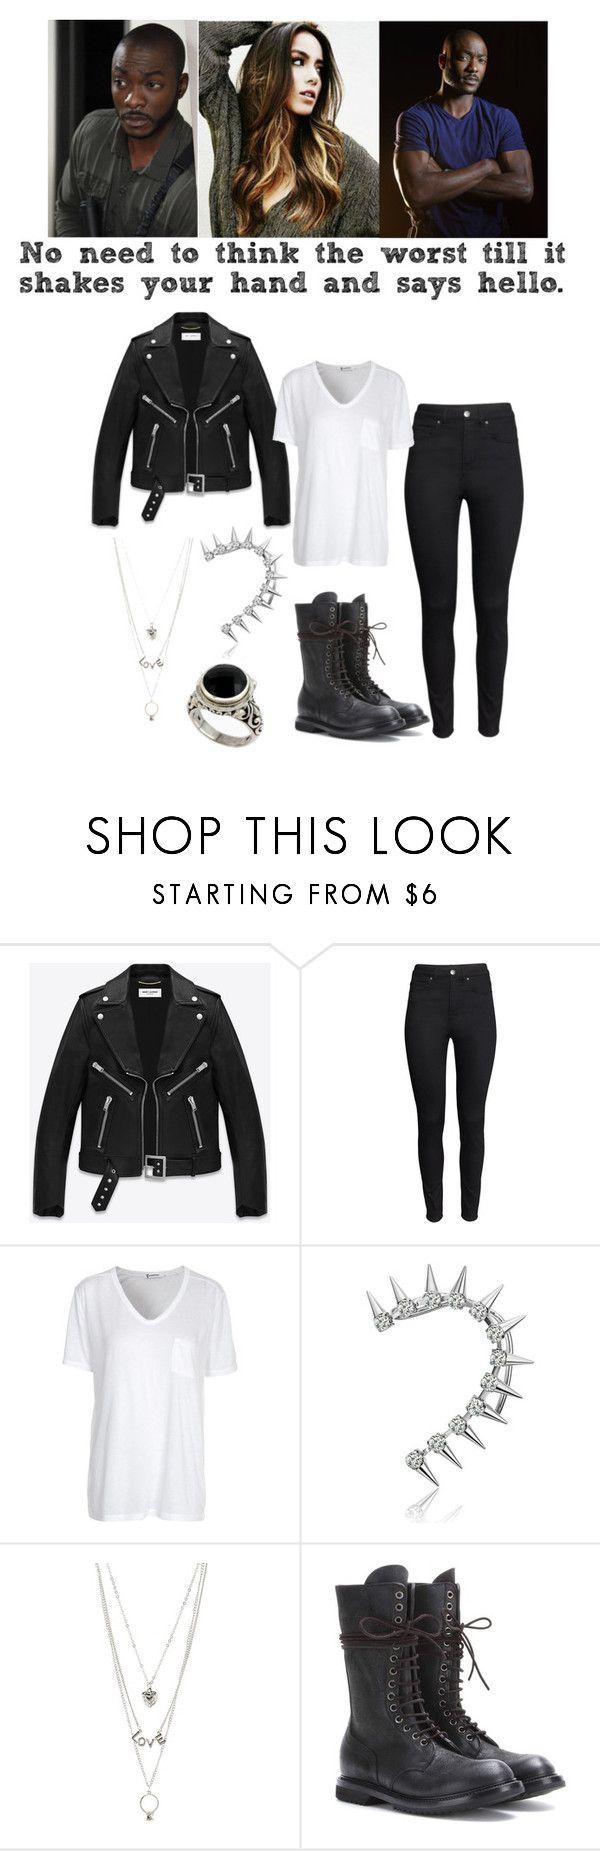 Designer Clothes Shoes Bags For Women Ssense Clothes Design Fashion Outfit Accessories